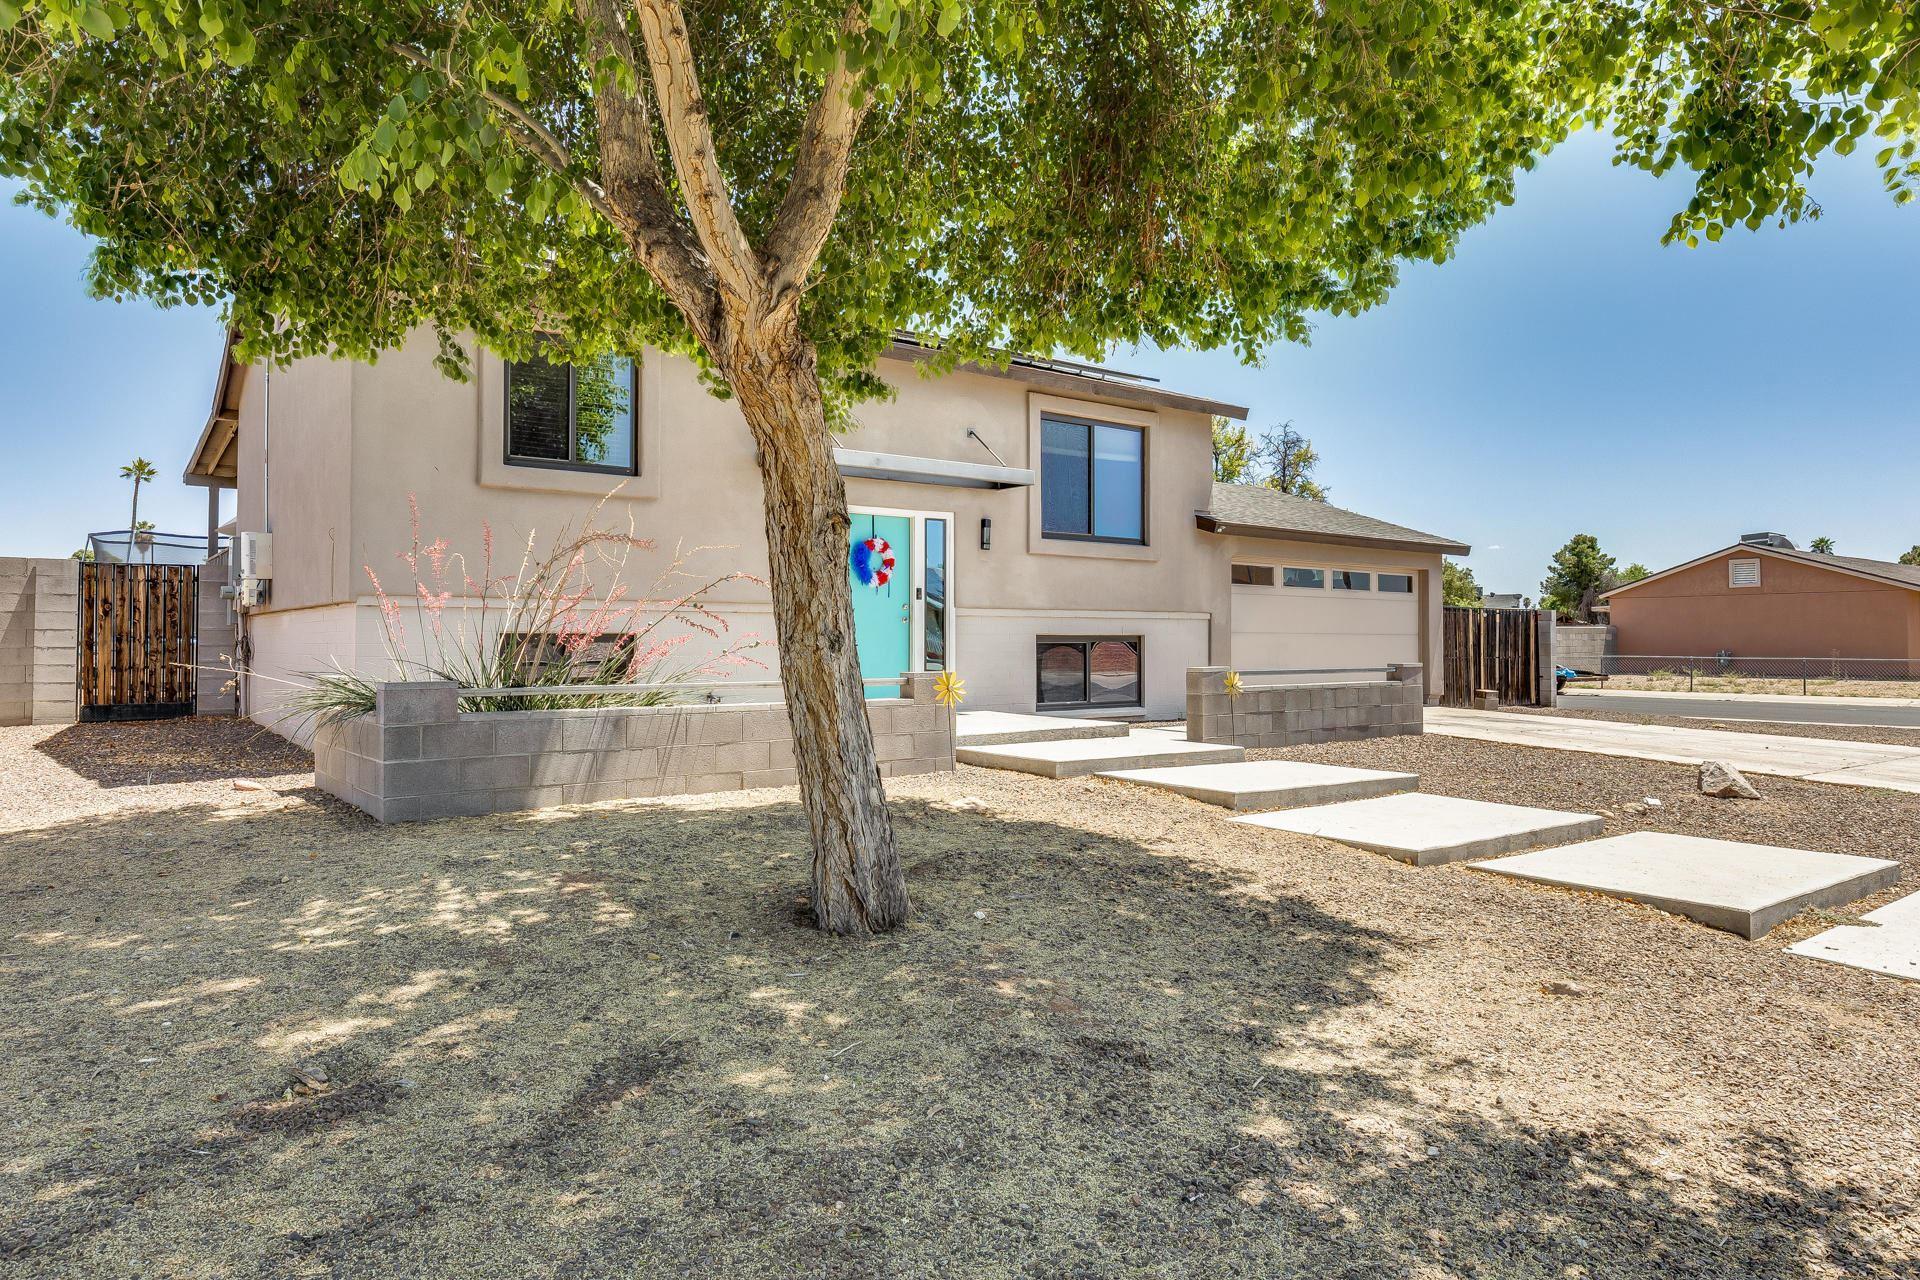 12671 N 38TH Avenue, Phoenix, AZ 85029 - MLS#: 6231438